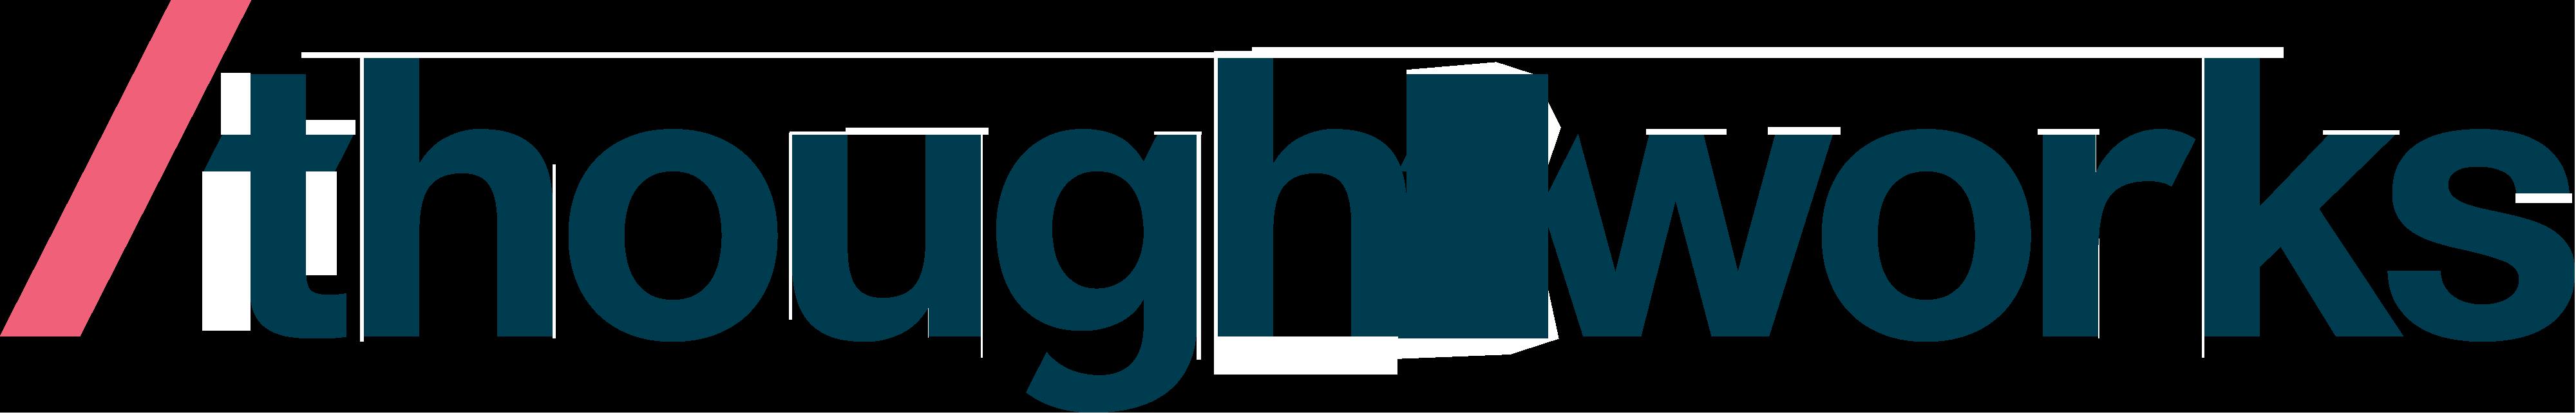 IPO компанії Thoughtworks Holding (TWKS)